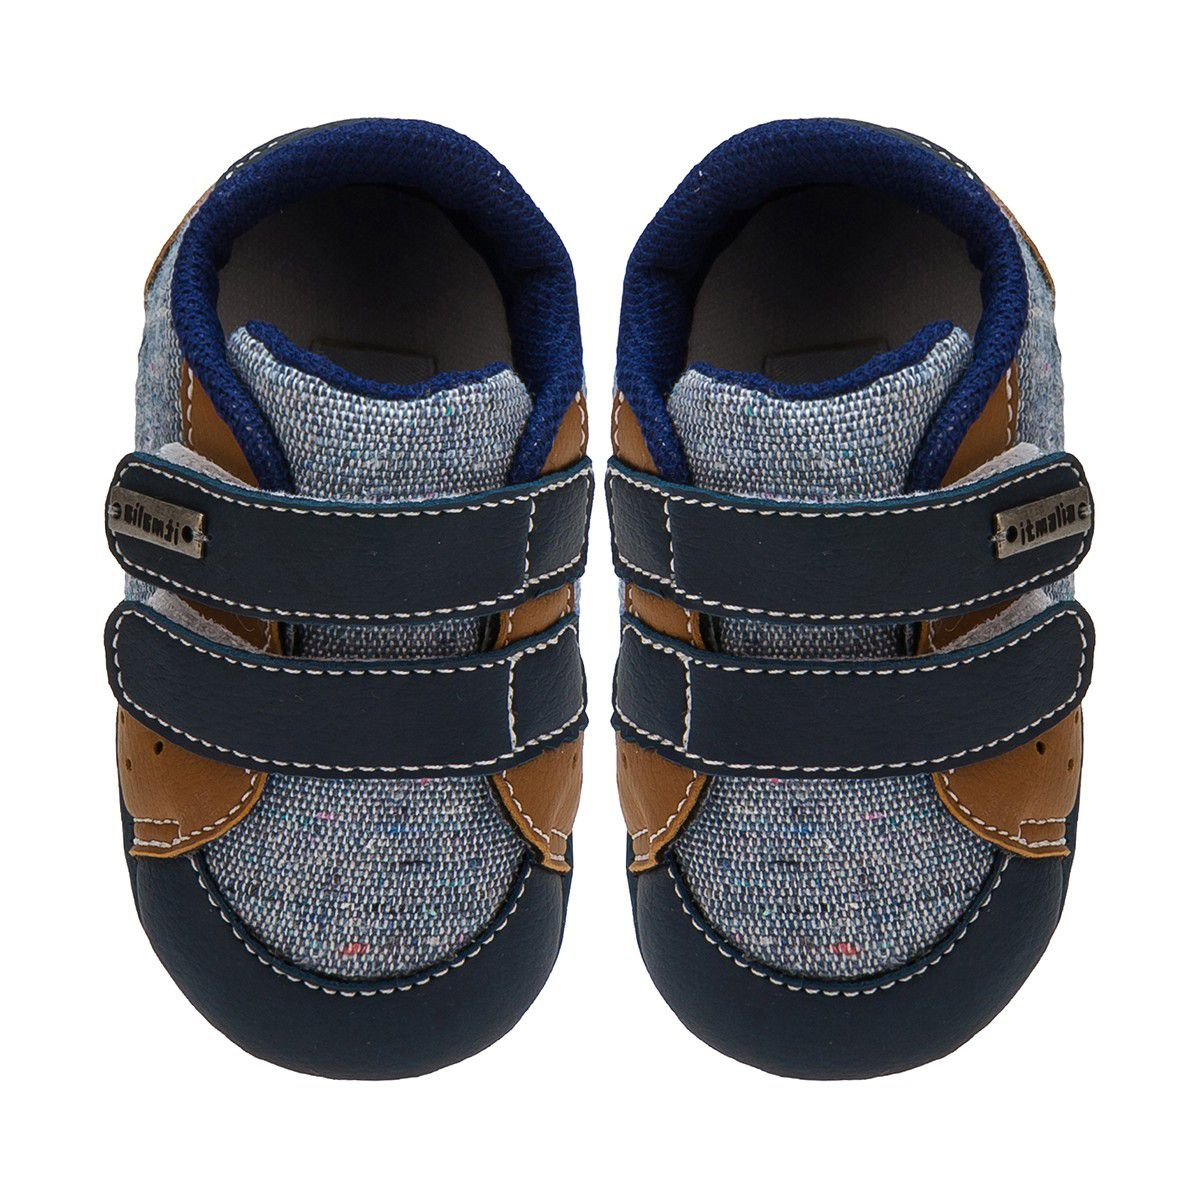 Tênis Menino Bebê Cor Jeans/Caramelo - Itmalia